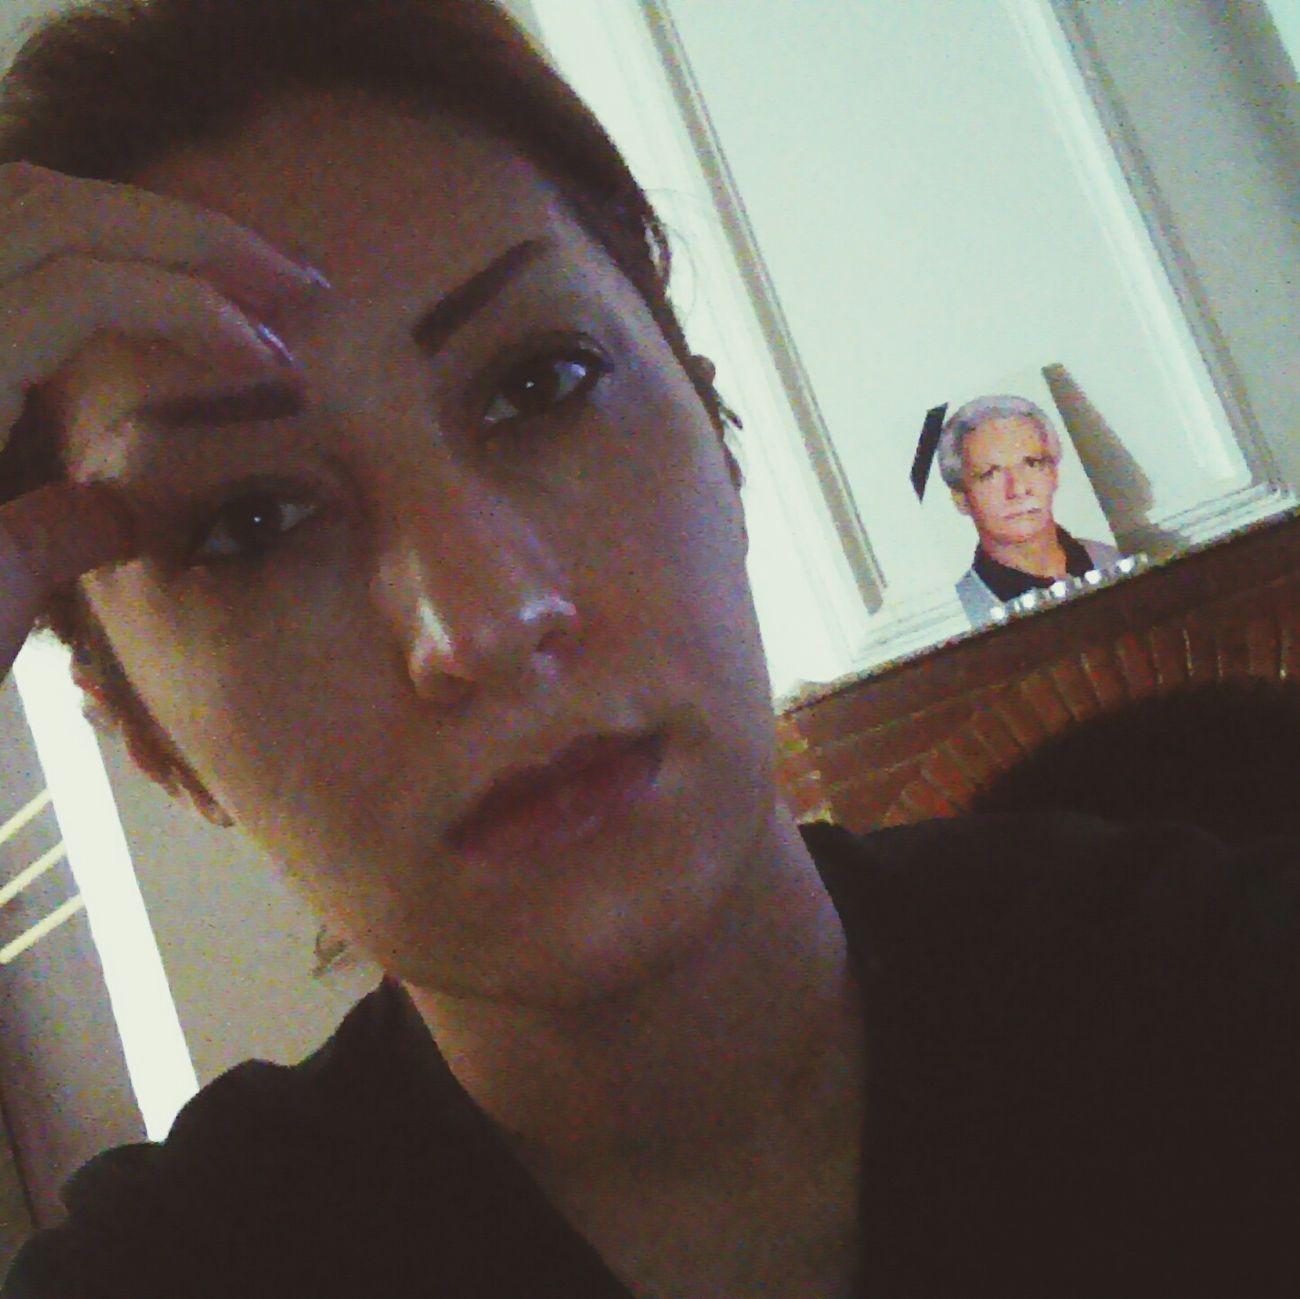 کنار تو آروم میام پا ميذارم،چراغی تو دست شبها جا ميذارم،که روشن بمونه آسمون پر ستاره That's Me Love ♥ Sahar Iran♥ My Life PhonePhotography Capture The Moment Loveyou Forever Whit You #❤️ Lost Died Die Iran Sadness Sad & Lonely Iwantyou